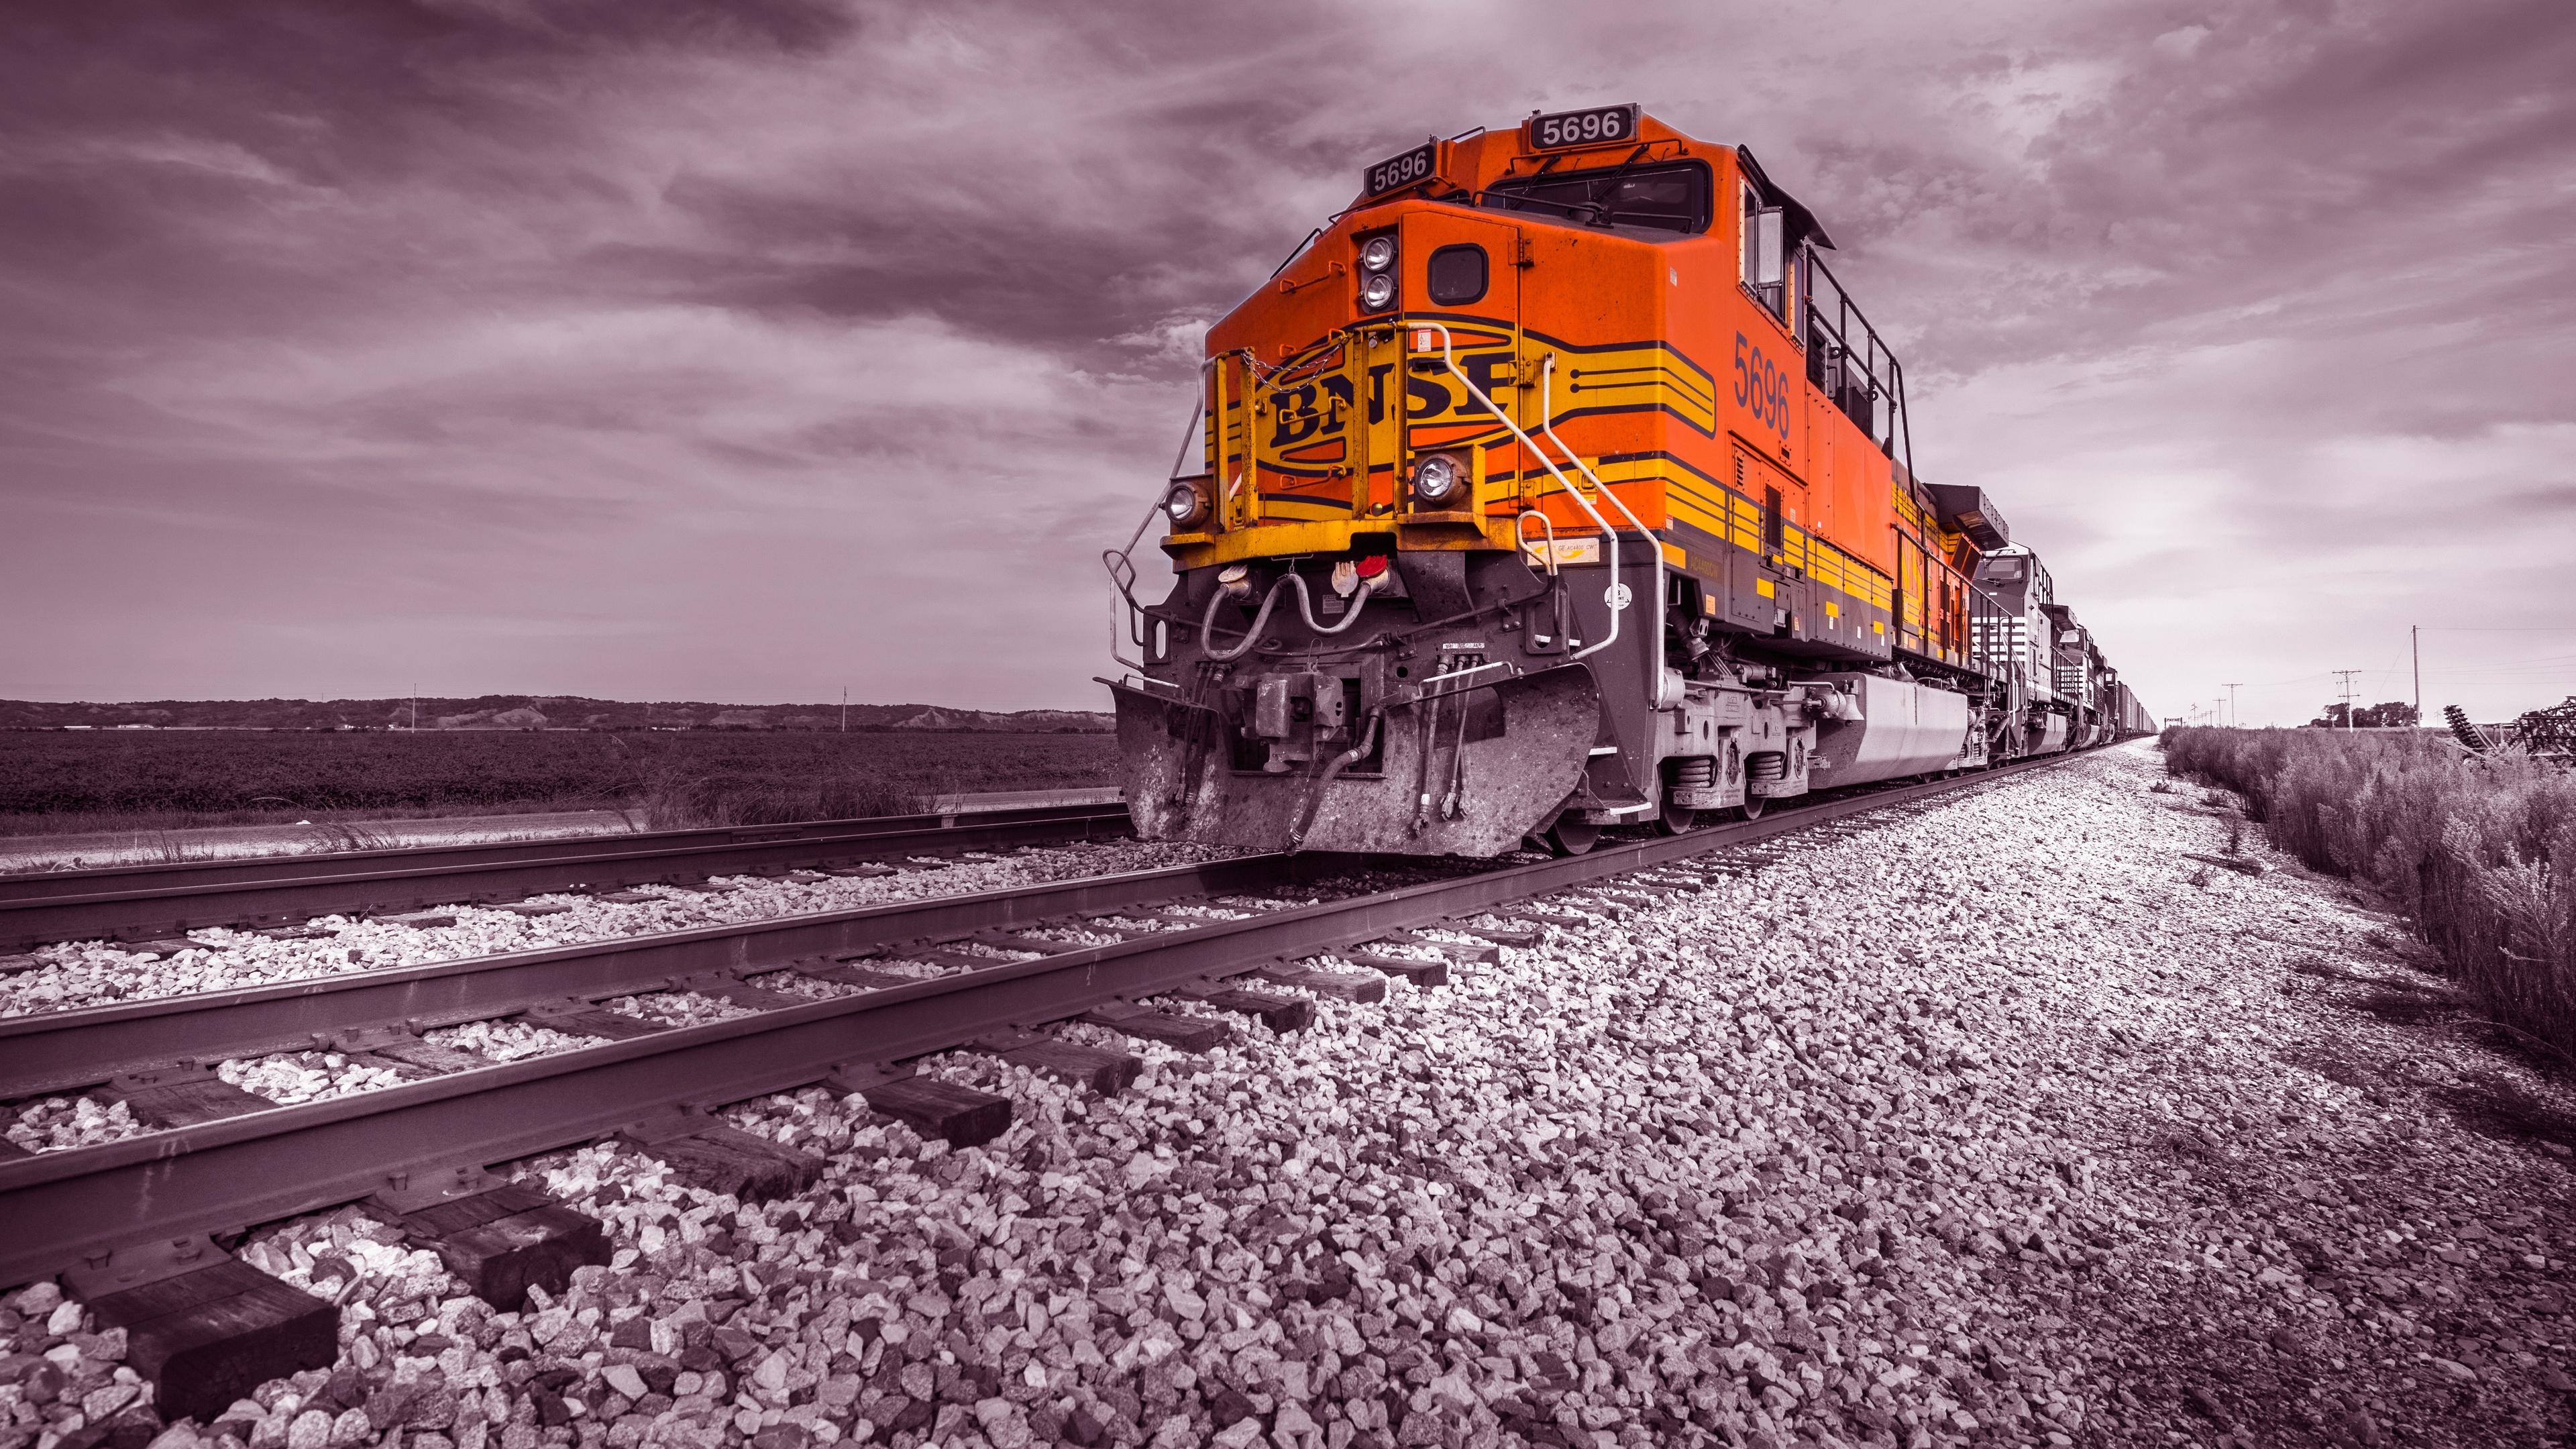 train-on-track-rz.jpg